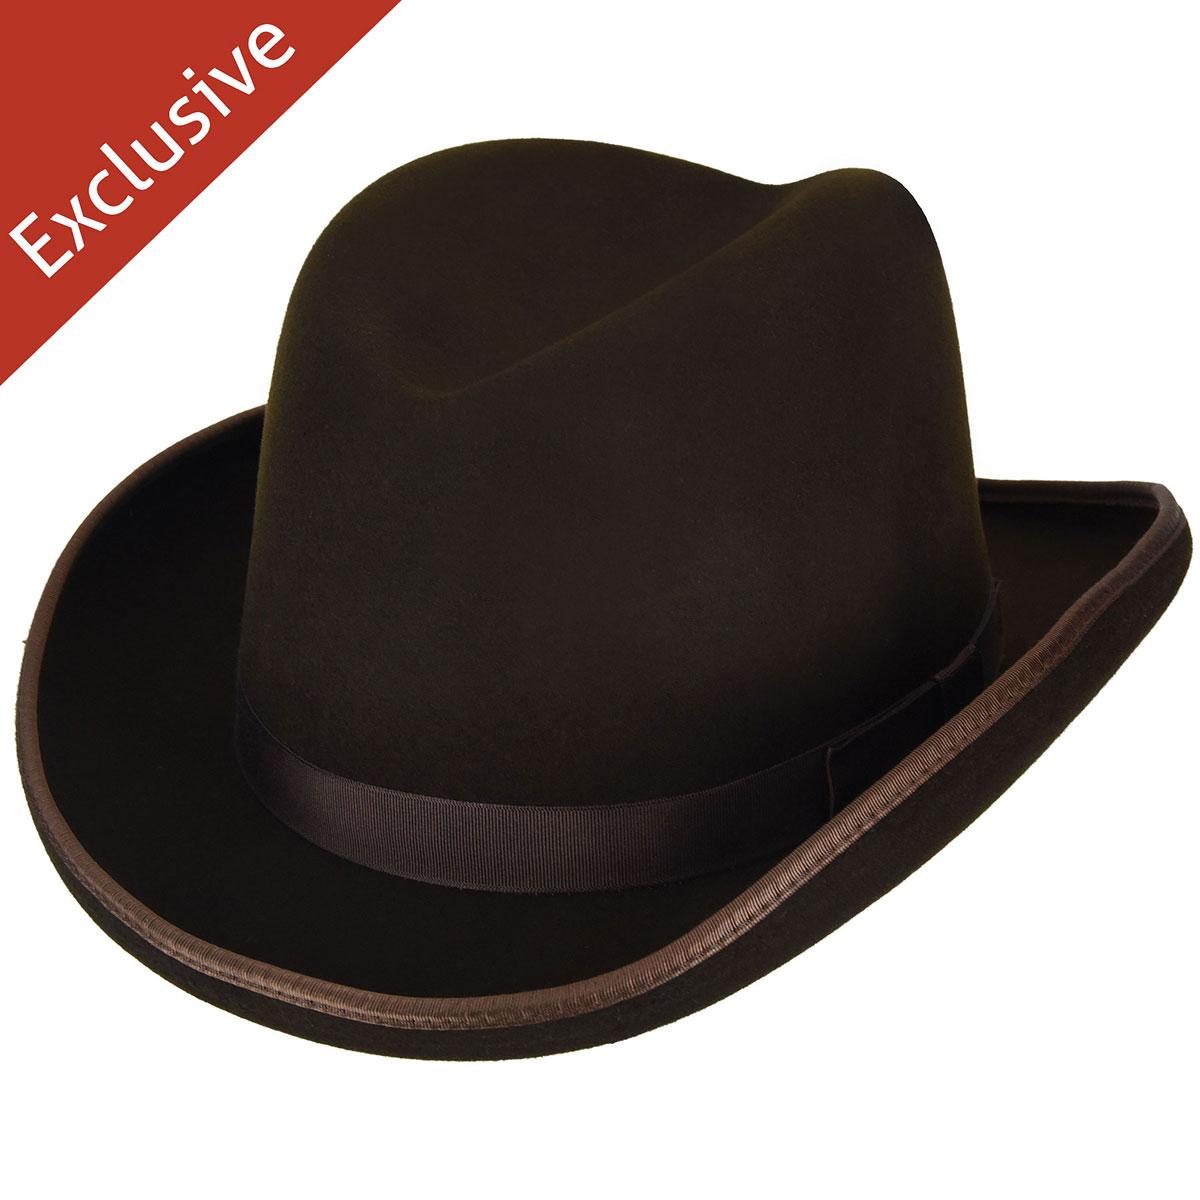 Hats.com Big Boss Homburg - Exclusive in Sudan